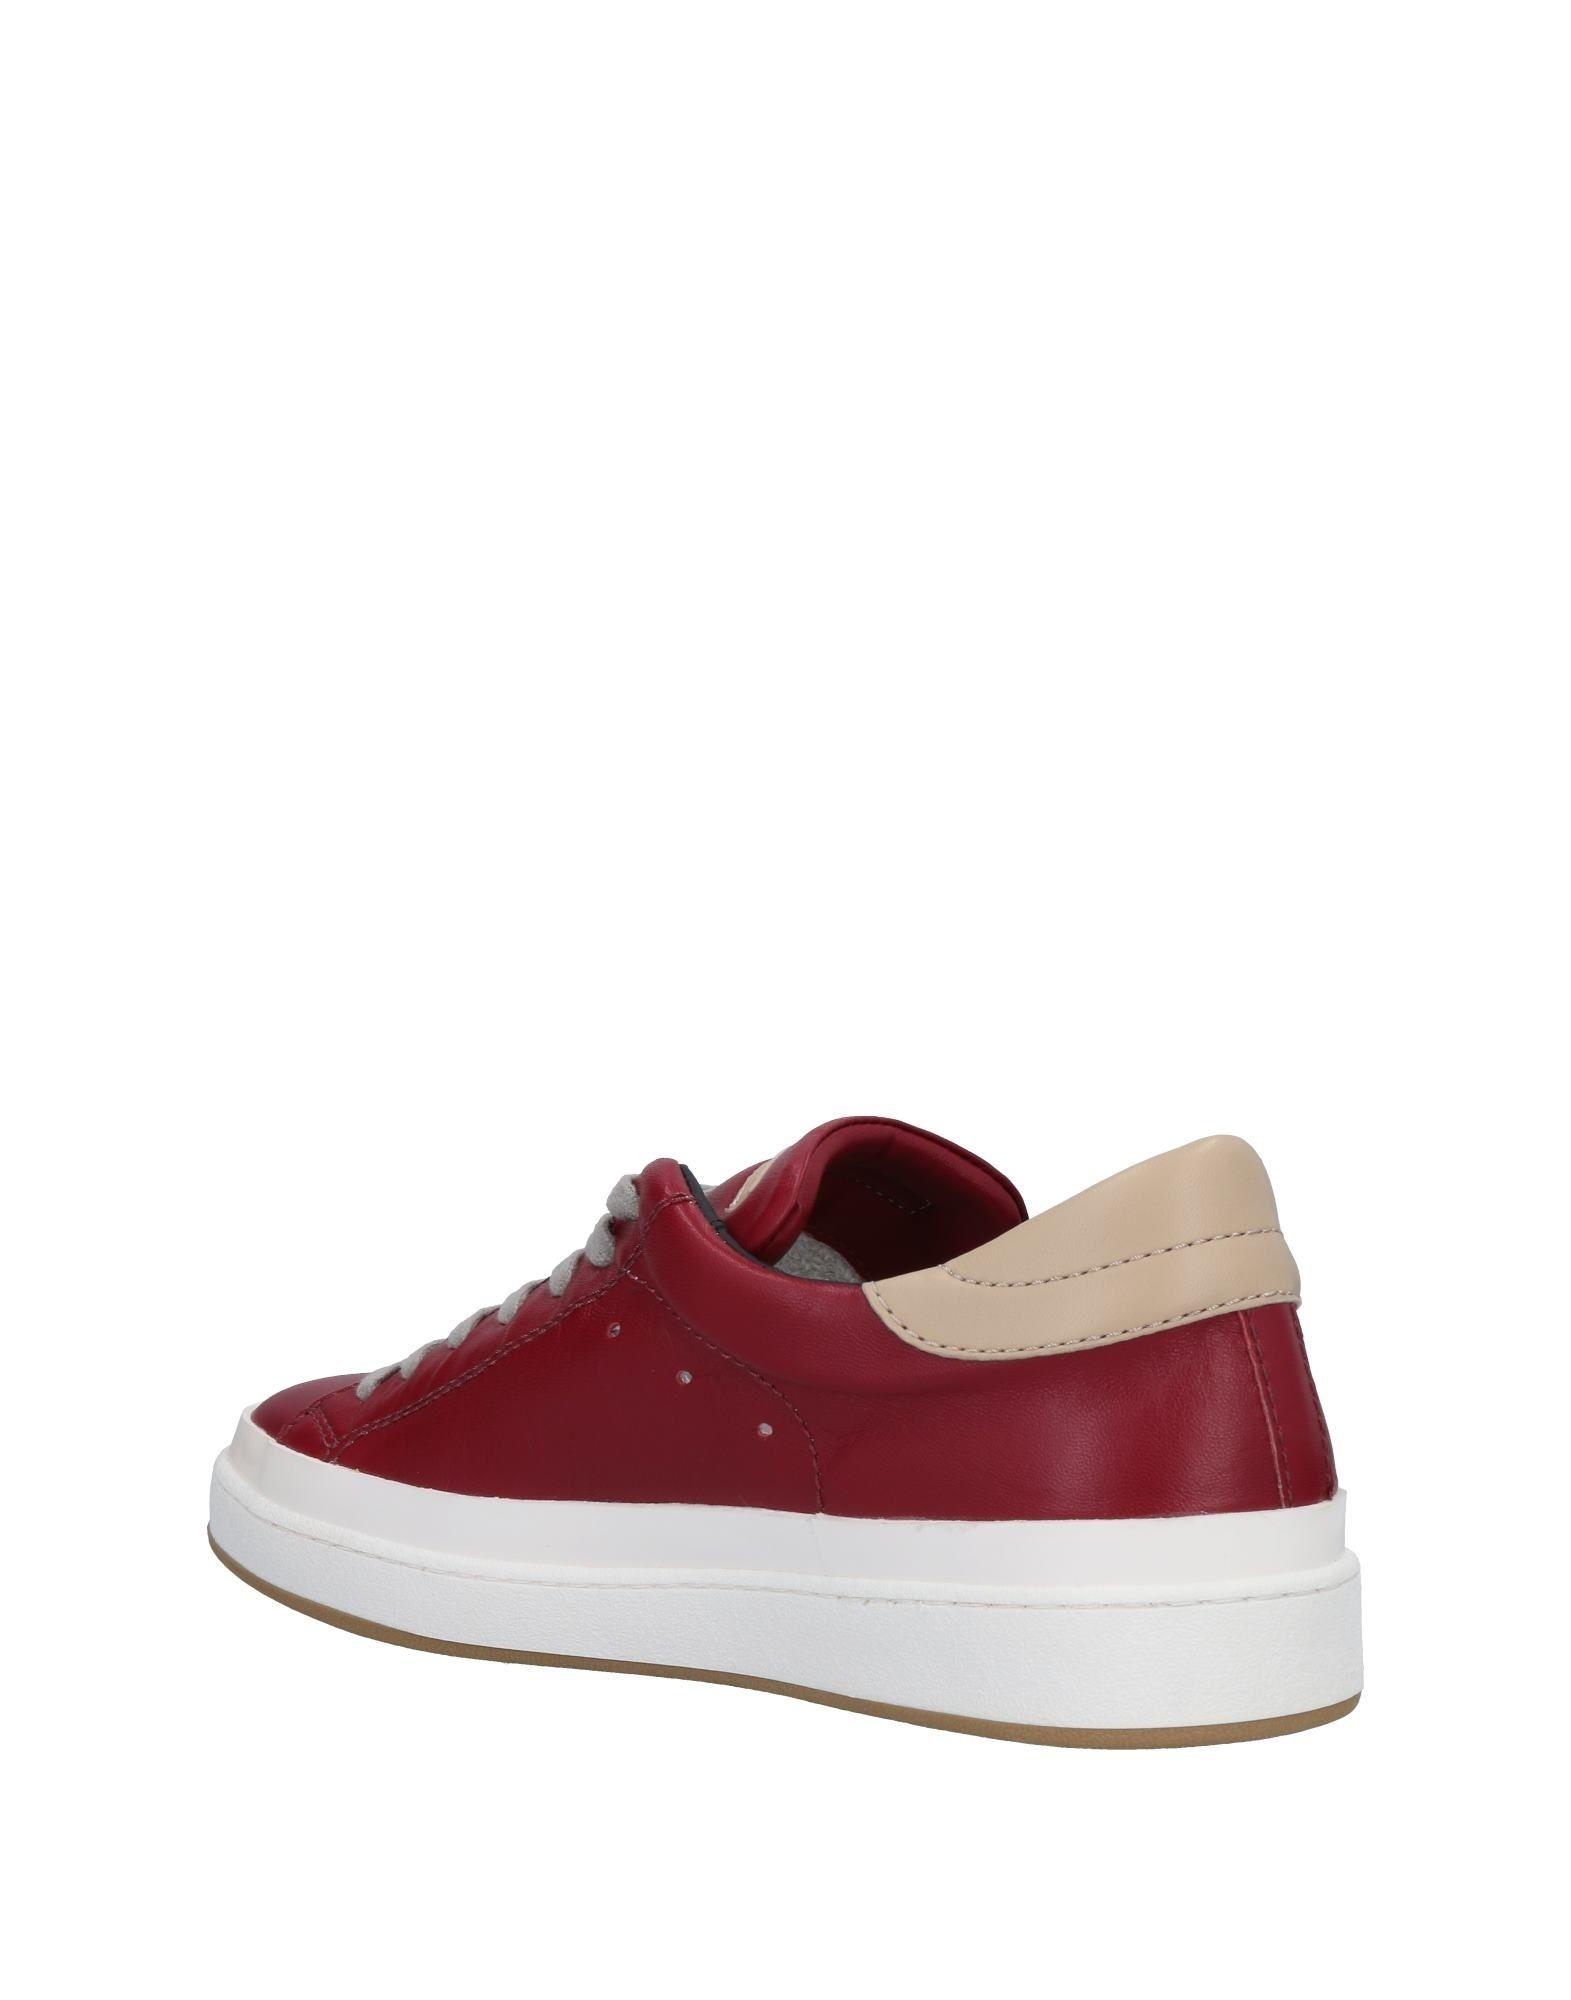 Philippe 11480721LG Model Sneakers Herren  11480721LG Philippe Gute Qualität beliebte Schuhe cbcda2